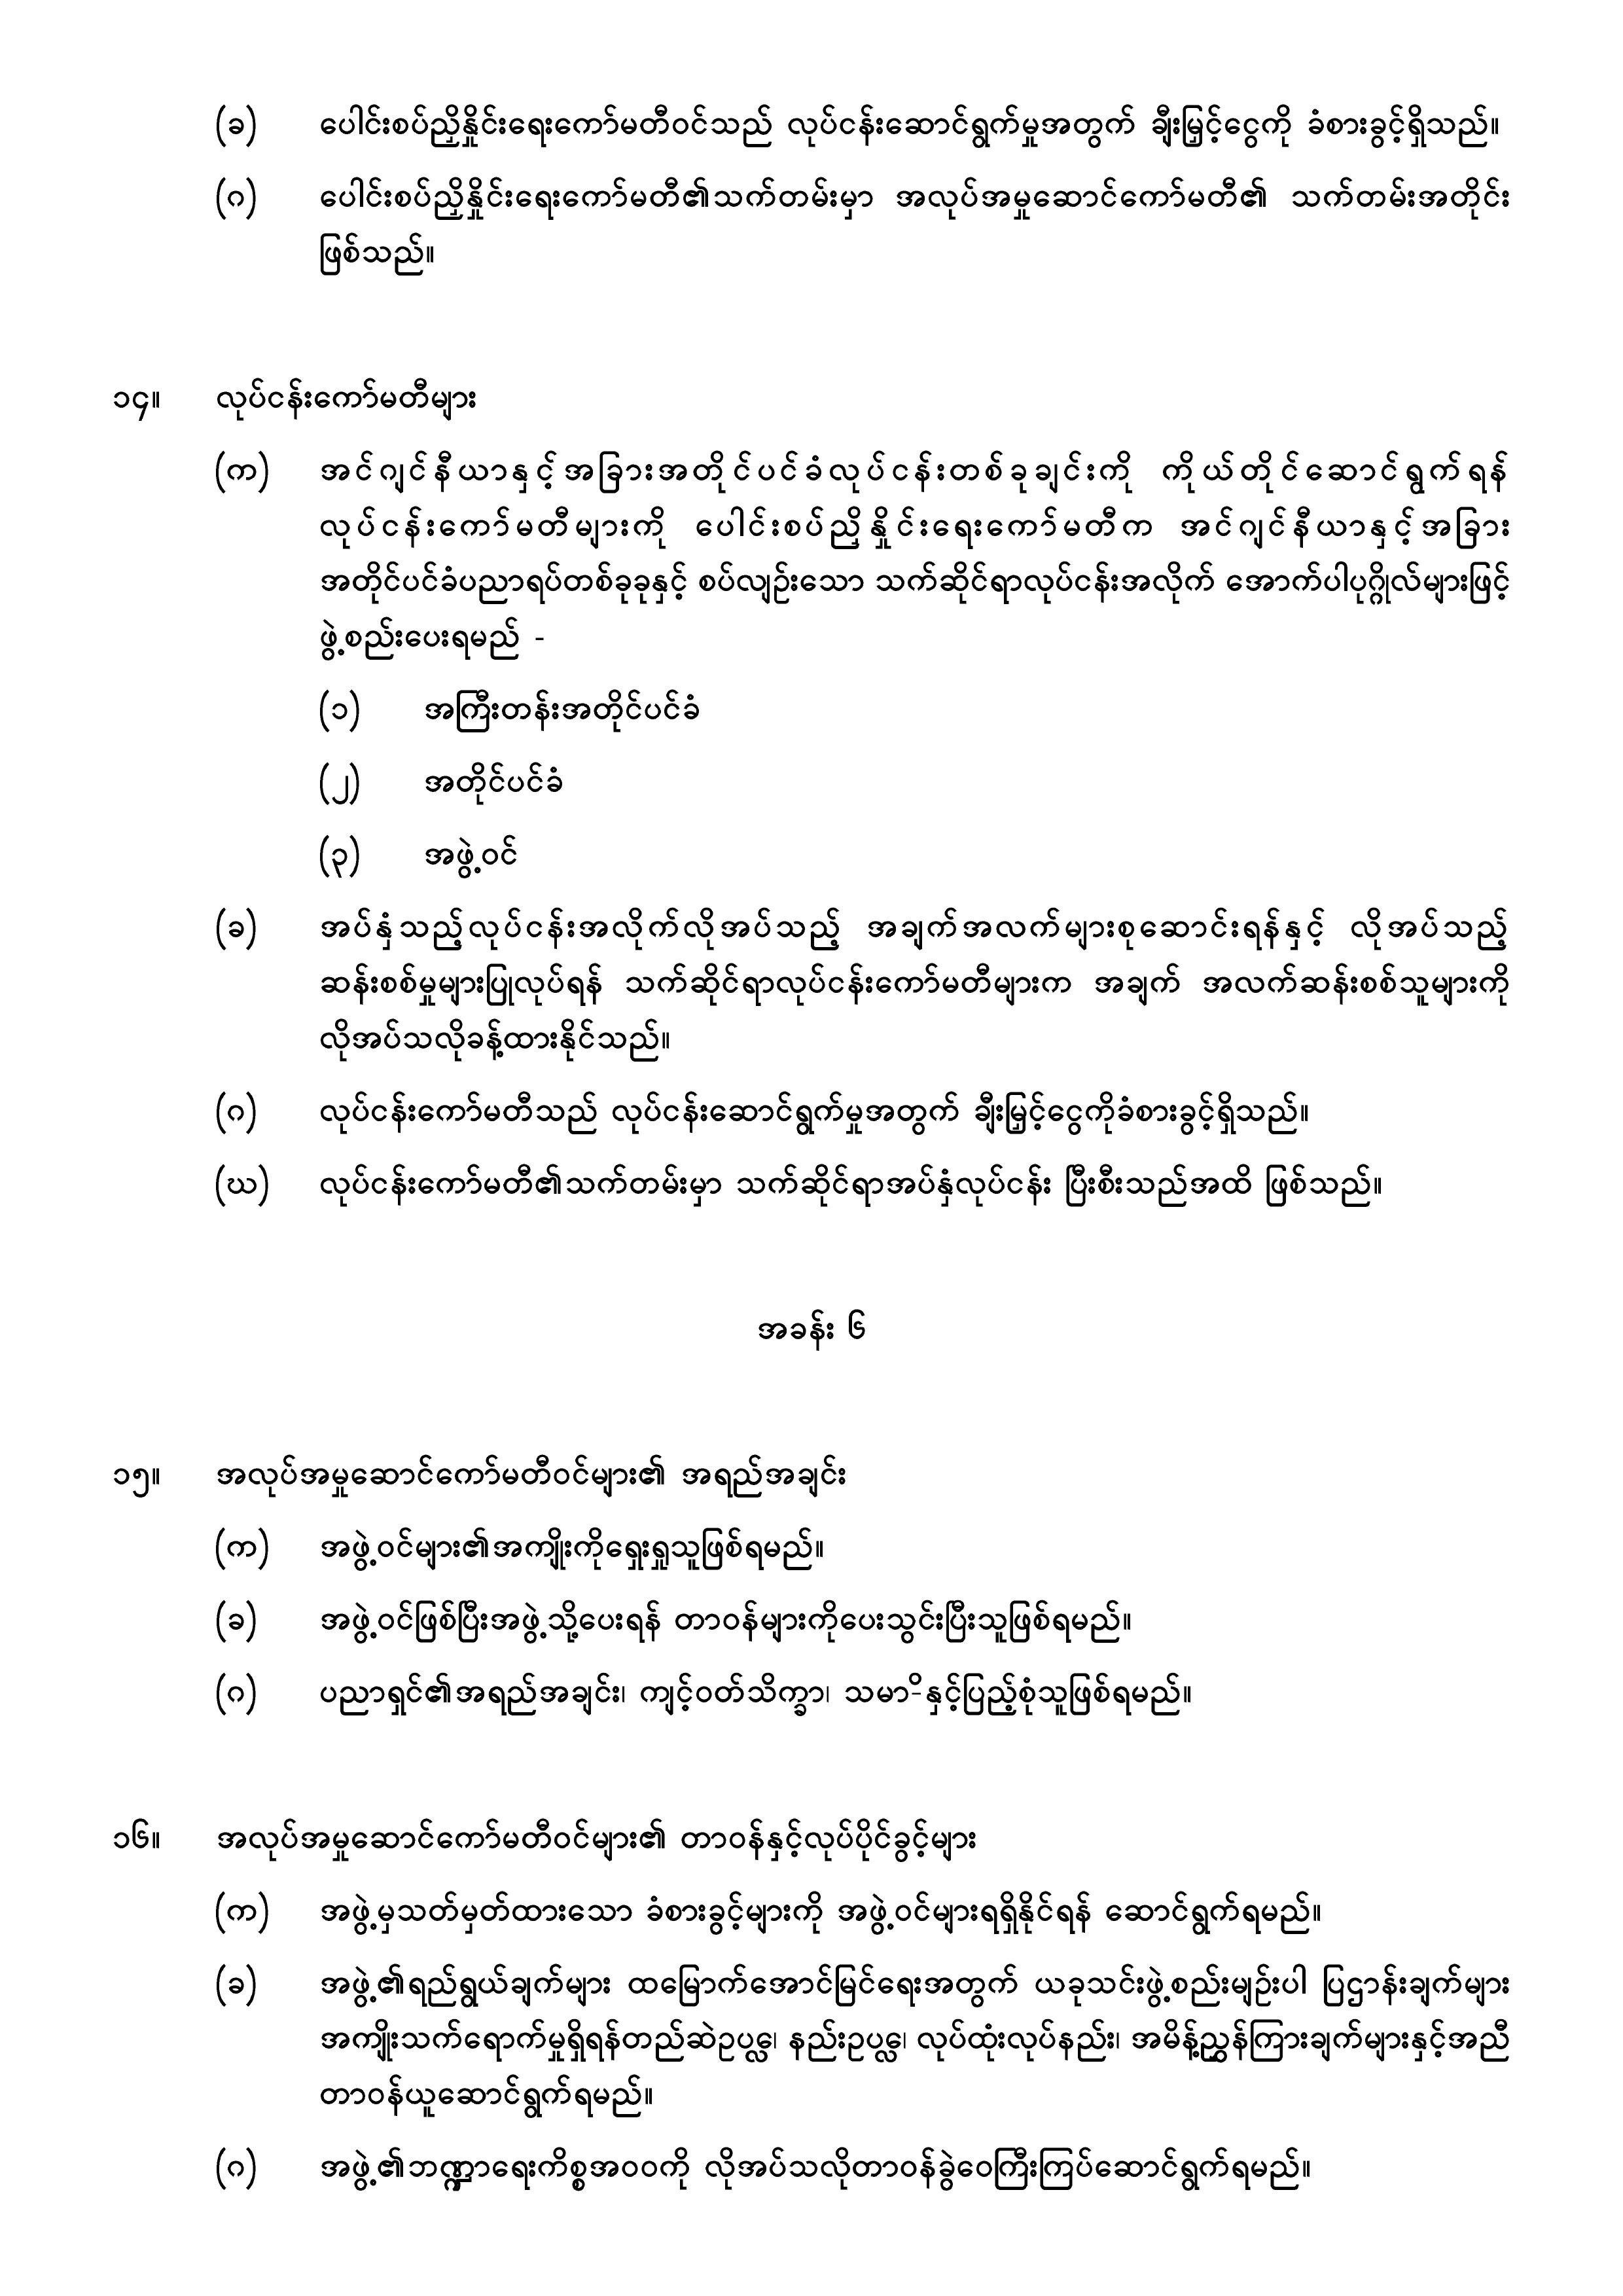 miceg-article-of-association-5